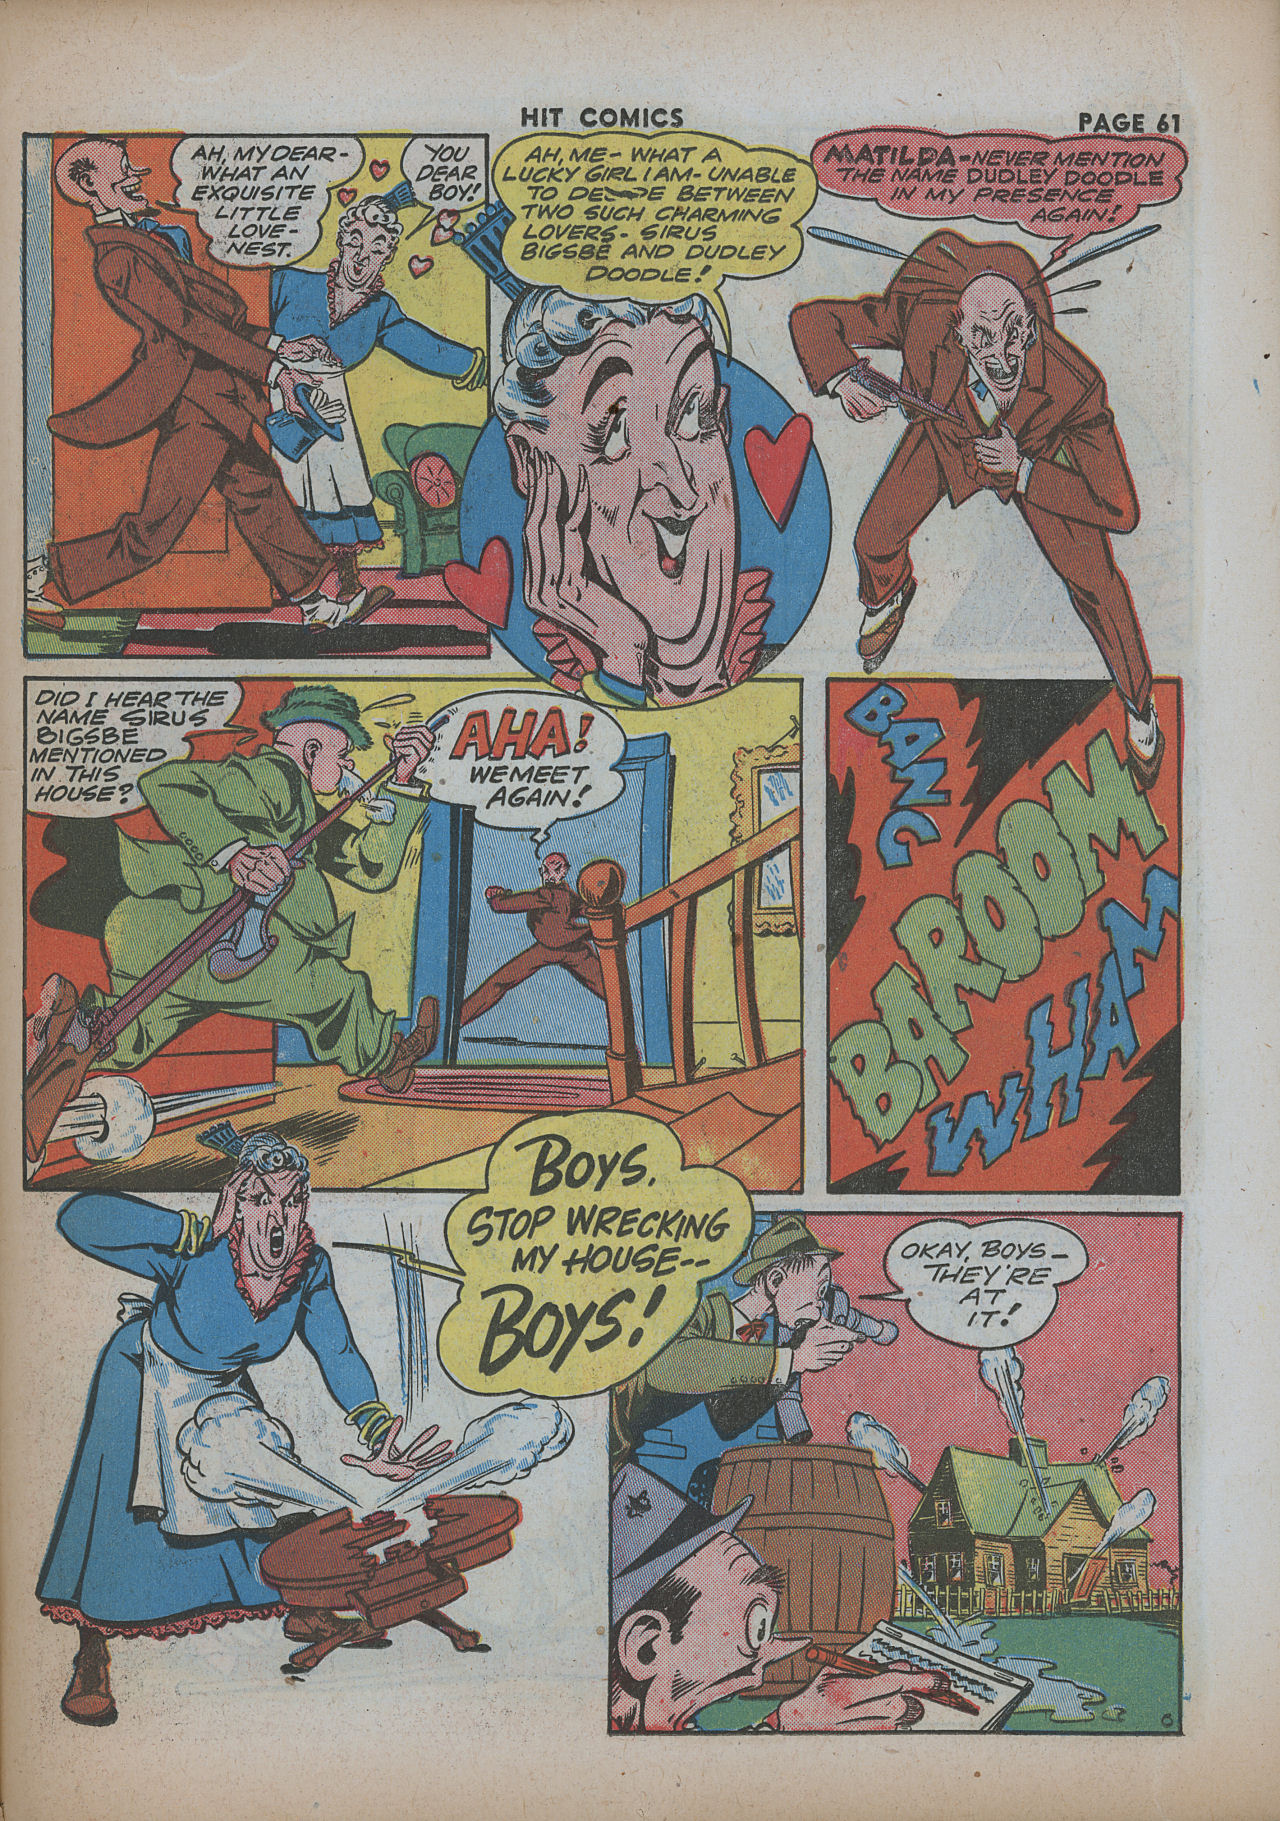 Read online Hit Comics comic -  Issue #26 - 62